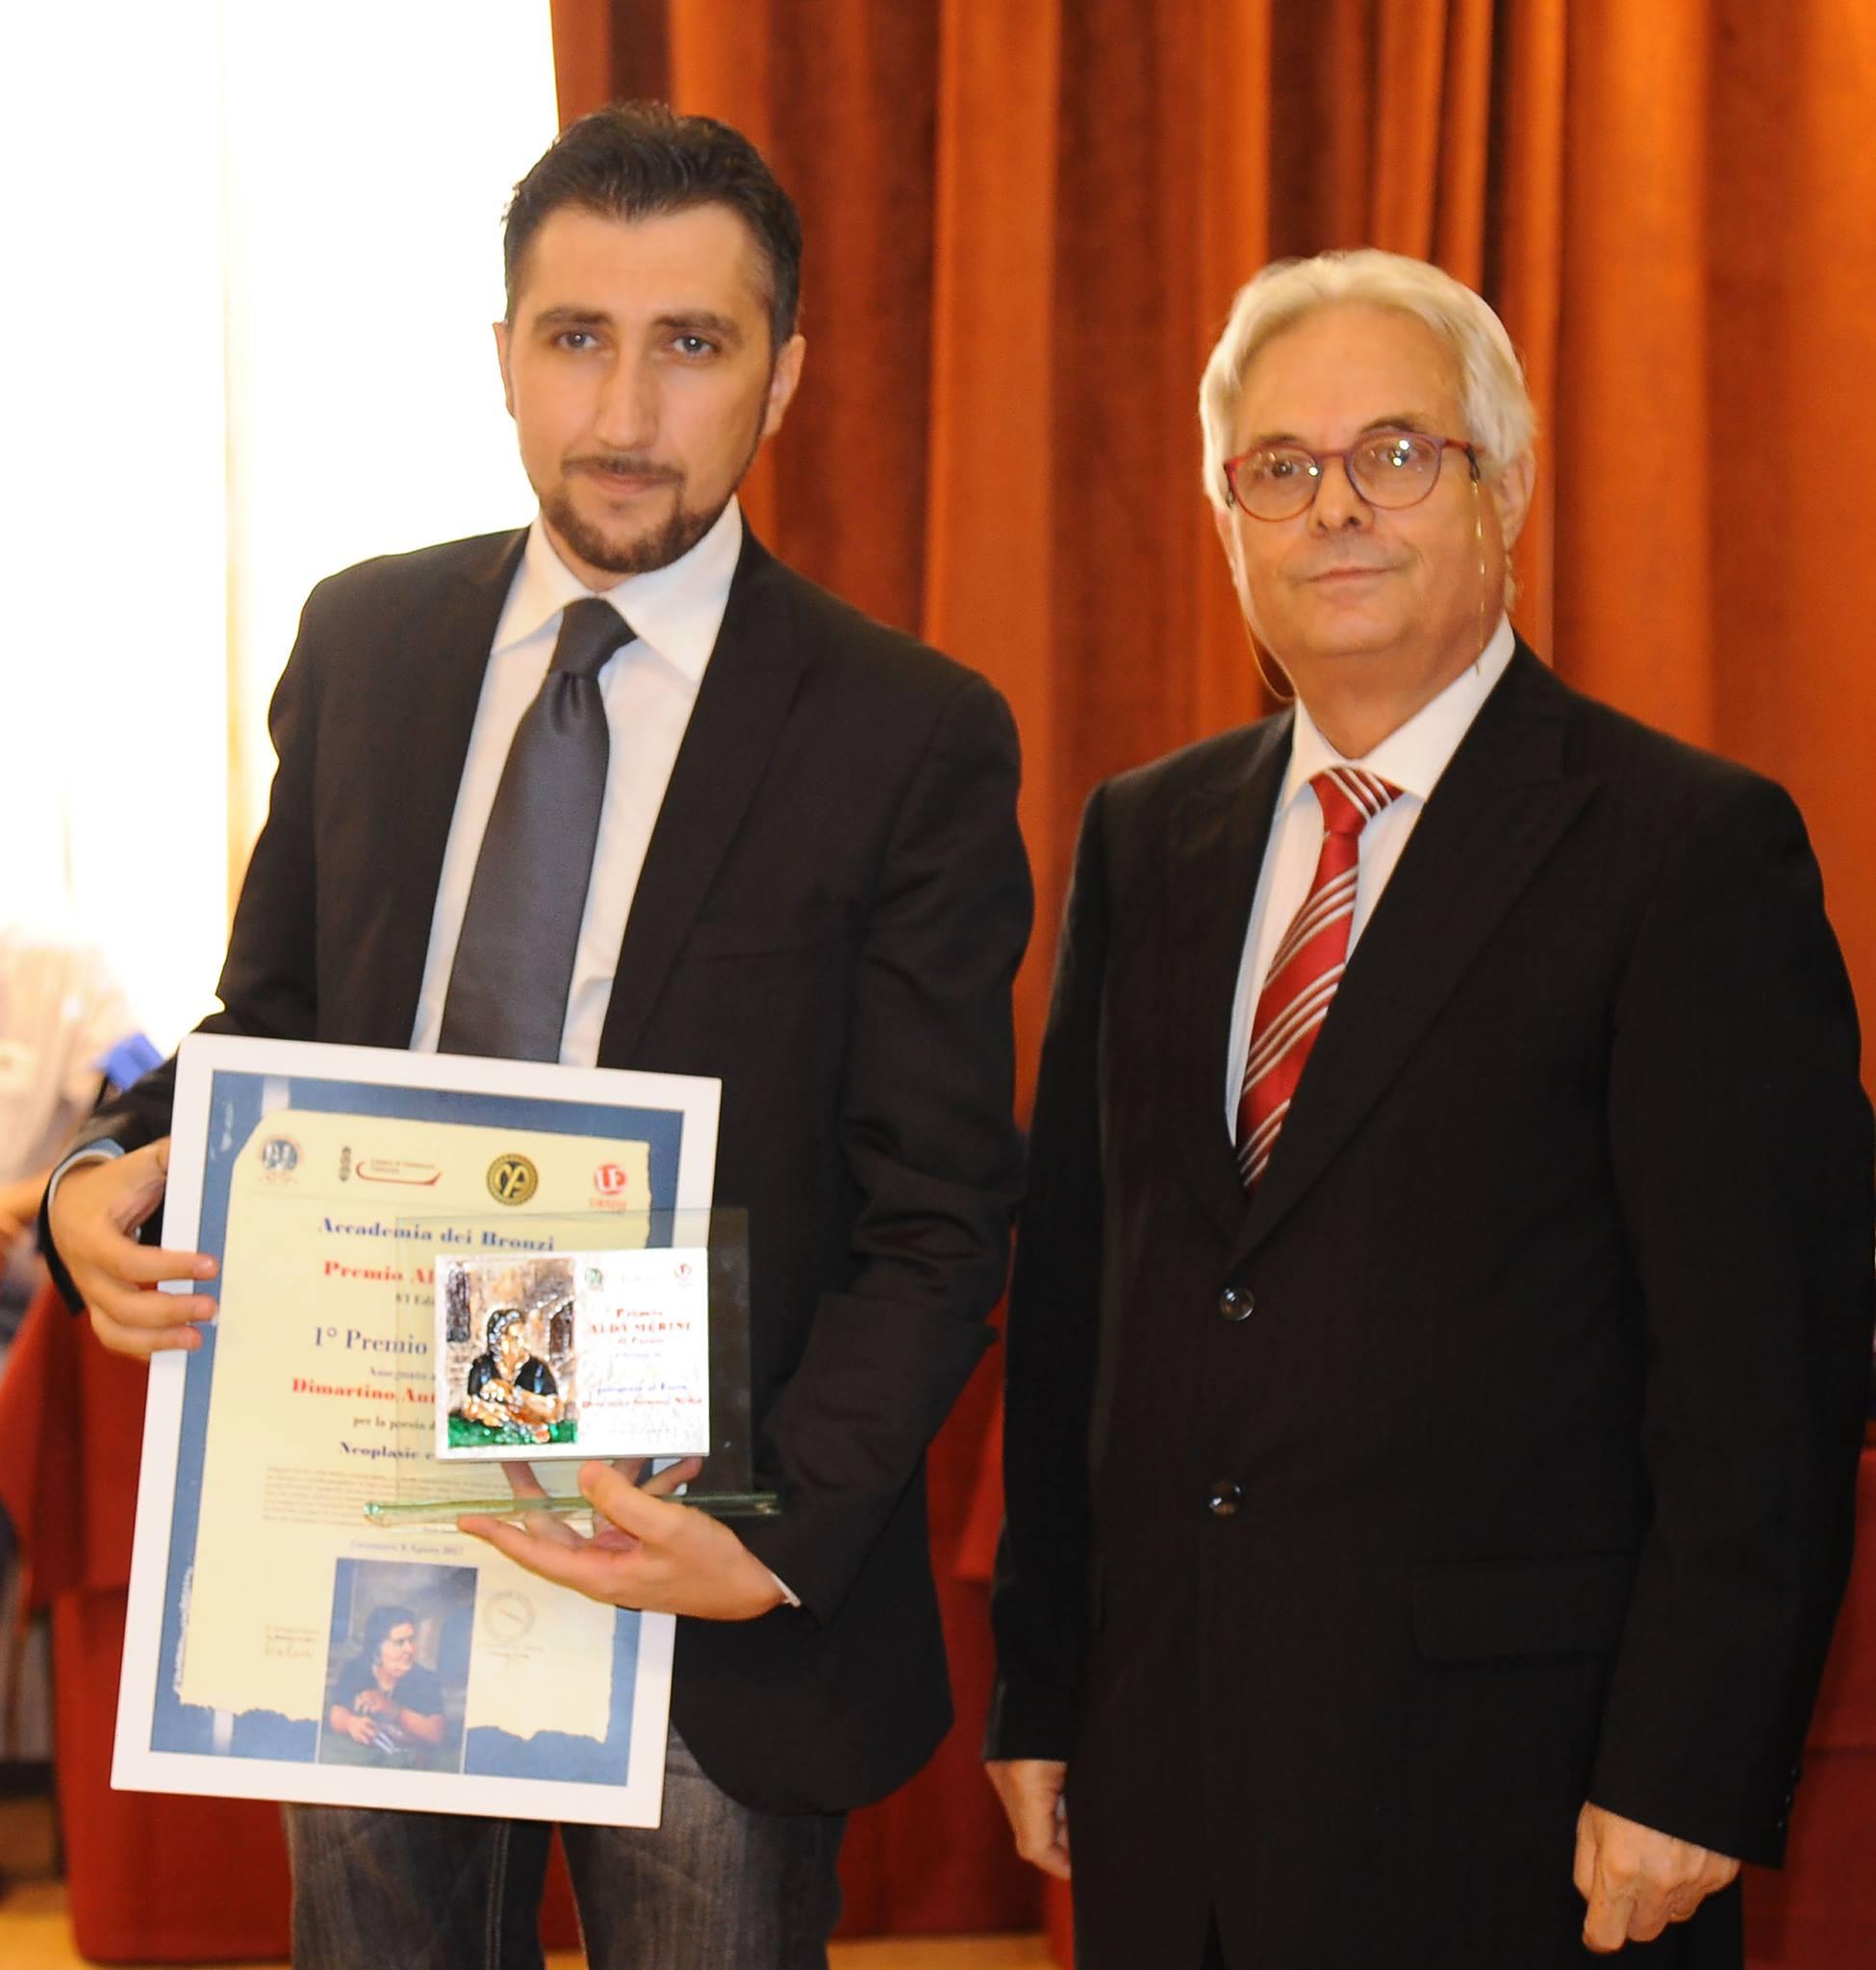 Premio Merini: Dimartino, poeta tarantino, ritira la targa d'argento di Michele Affidato